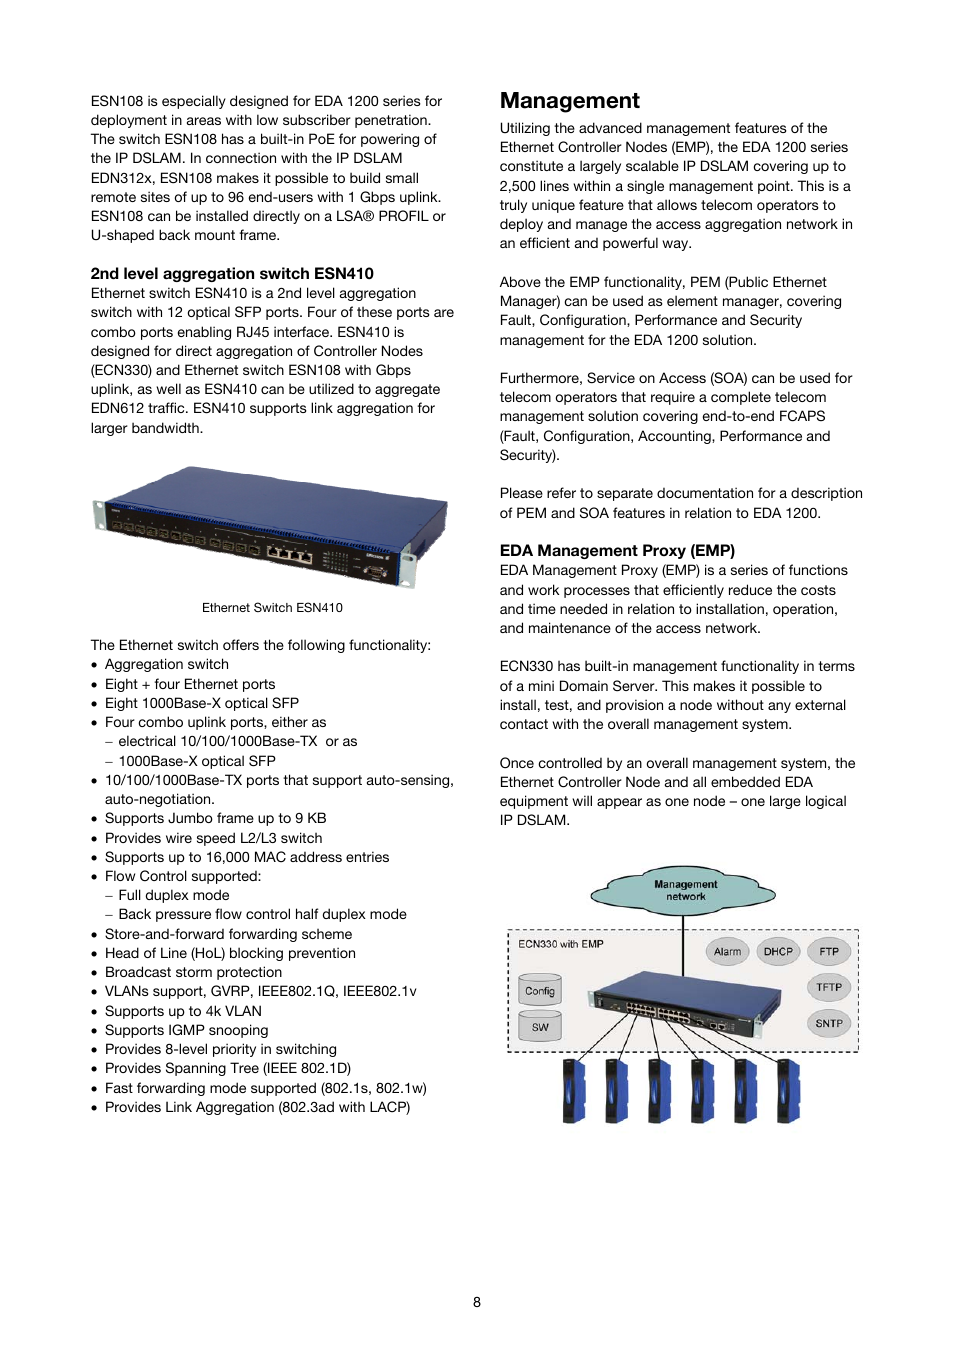 Management | Ericsson SOLUTION DESCRIPTION EDA 1200 4 0 User Manual